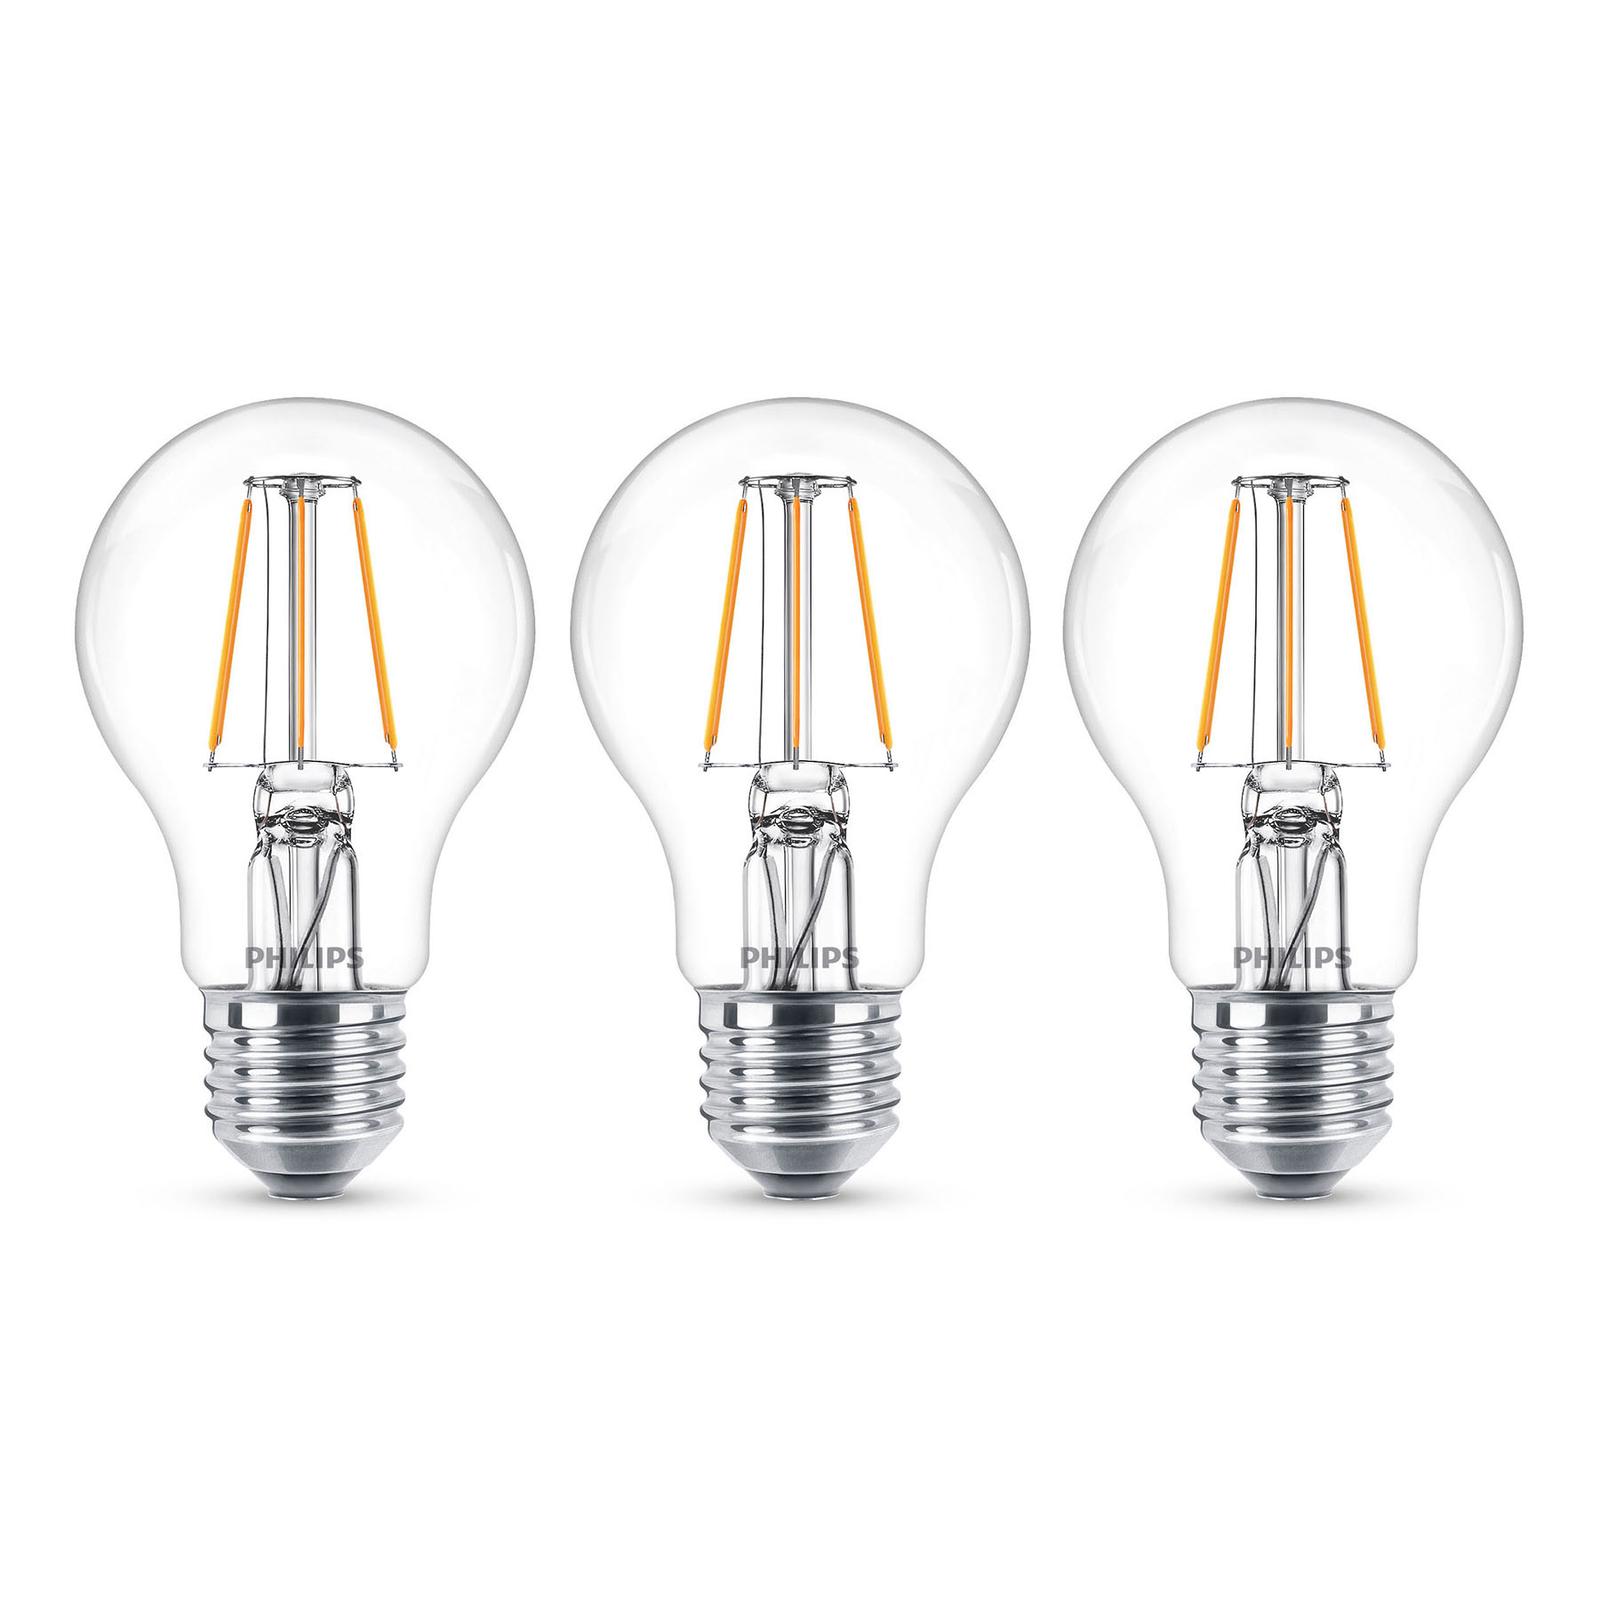 Philips LED-pære Classic E27 4,3W 2700K klar 3er